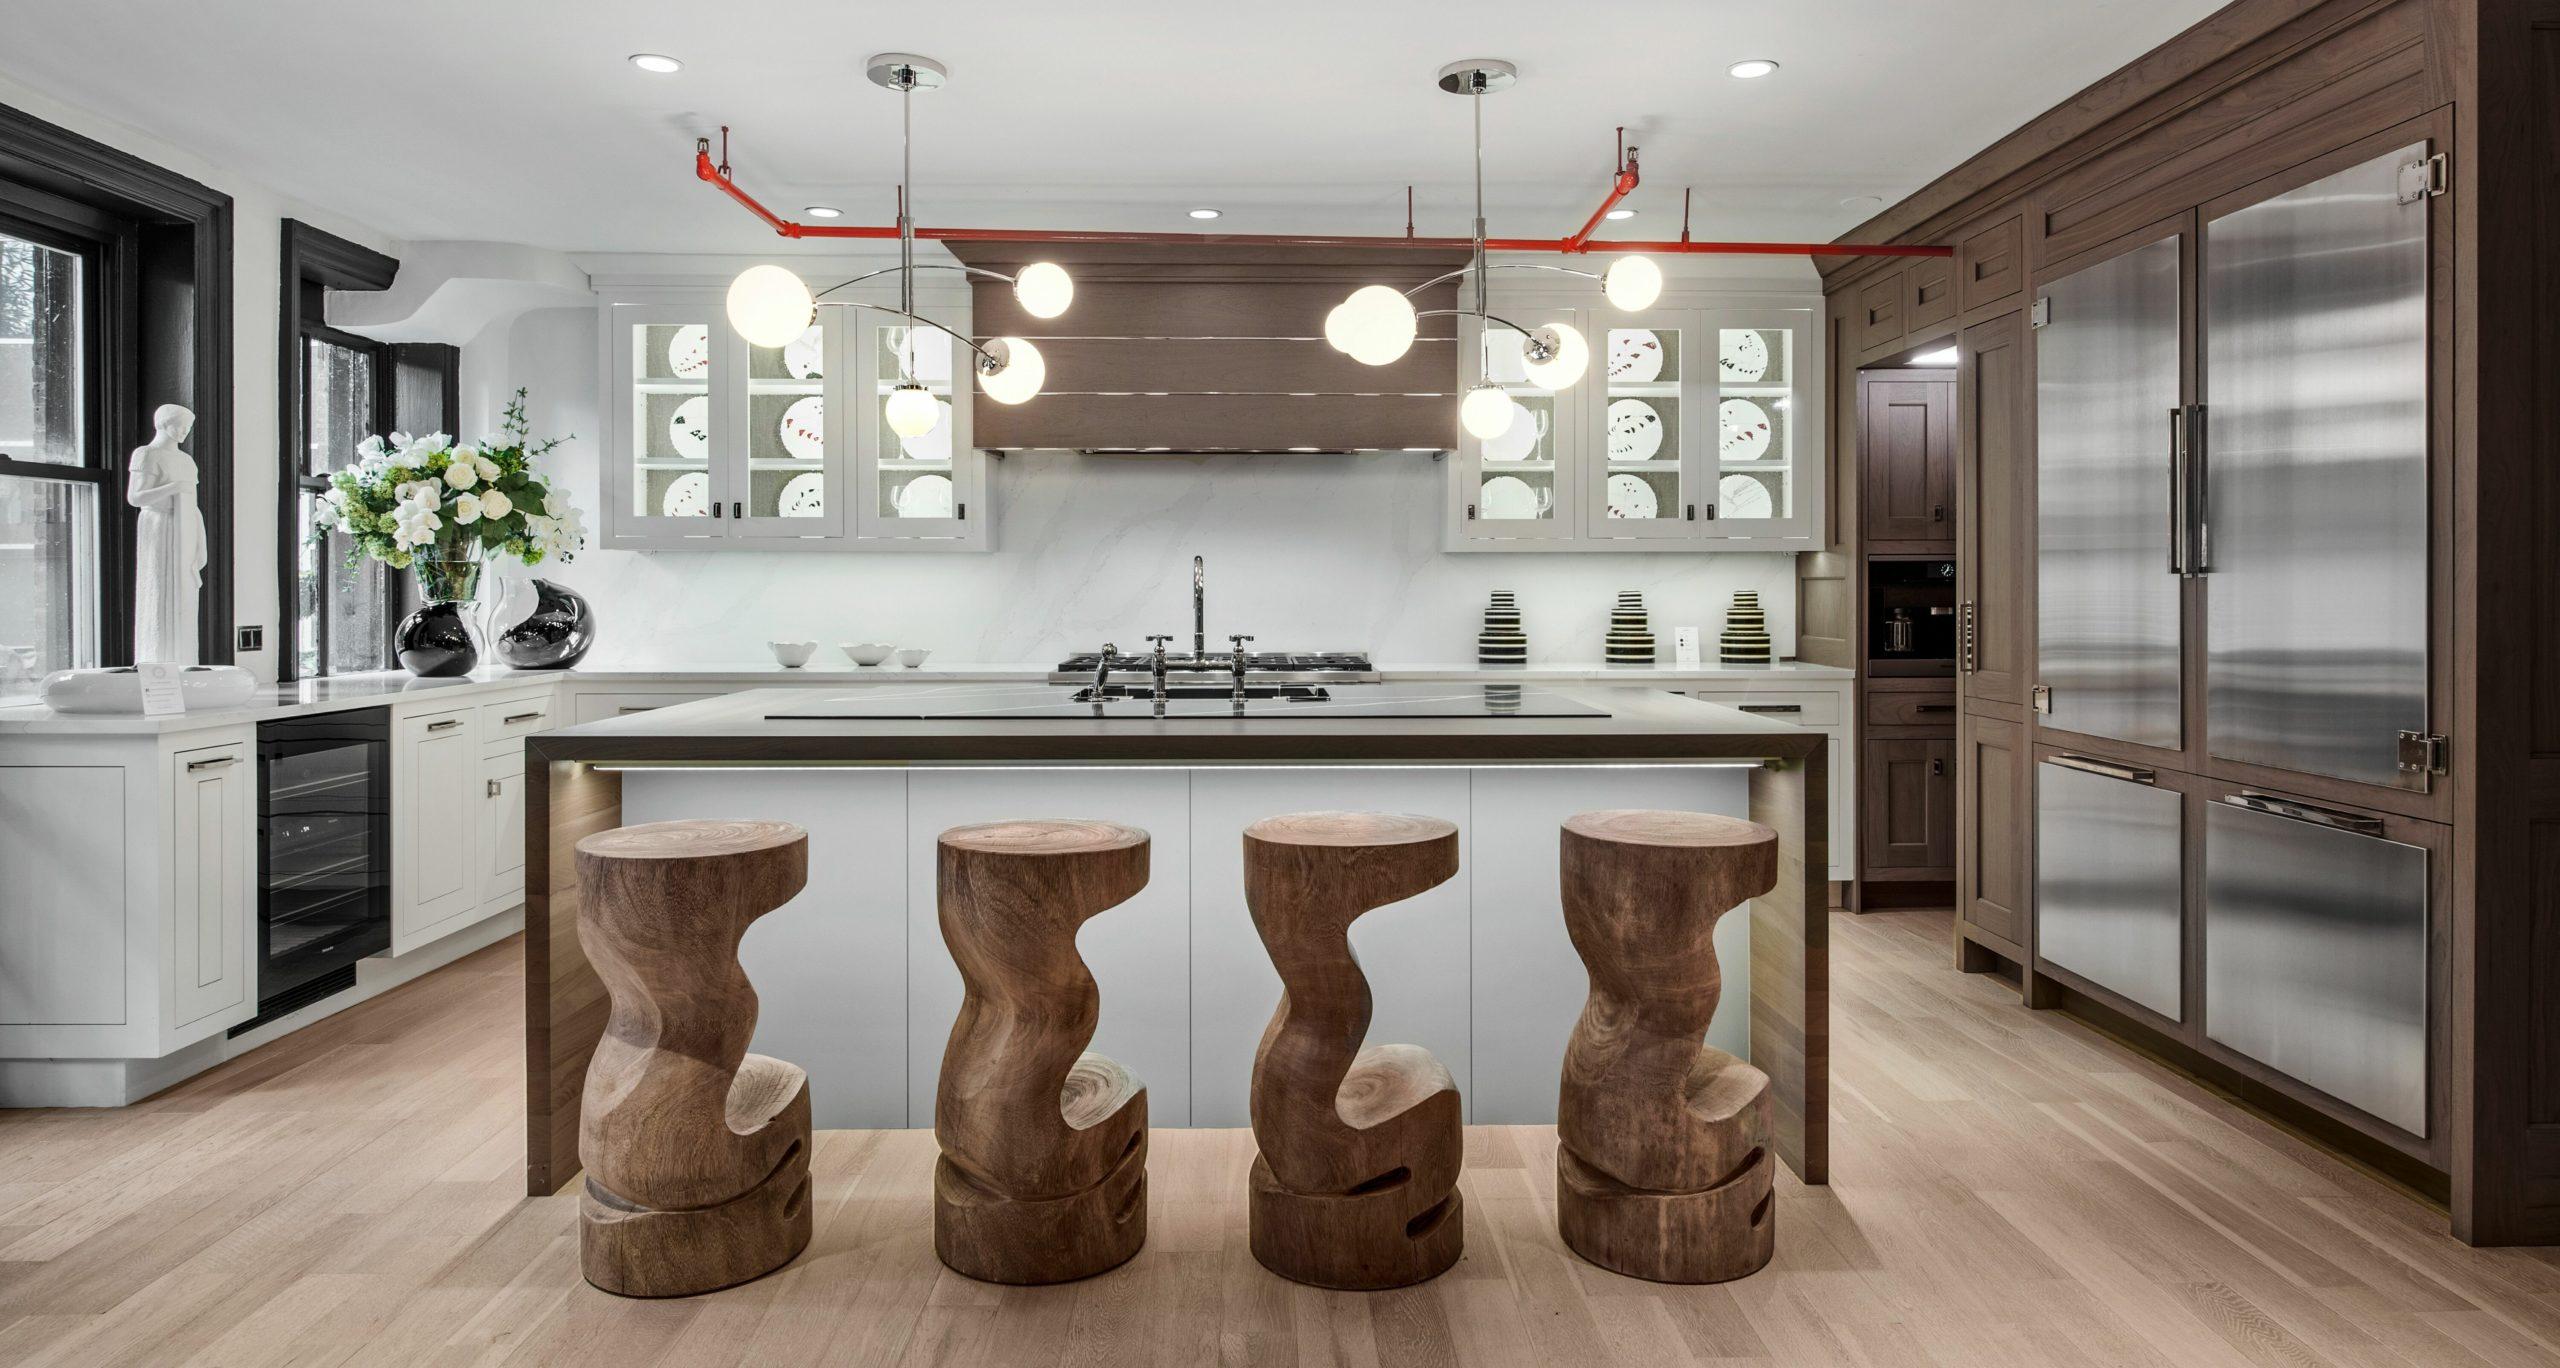 A Bakes & Kropp kitchen. COURTESY BAKES & KROPP